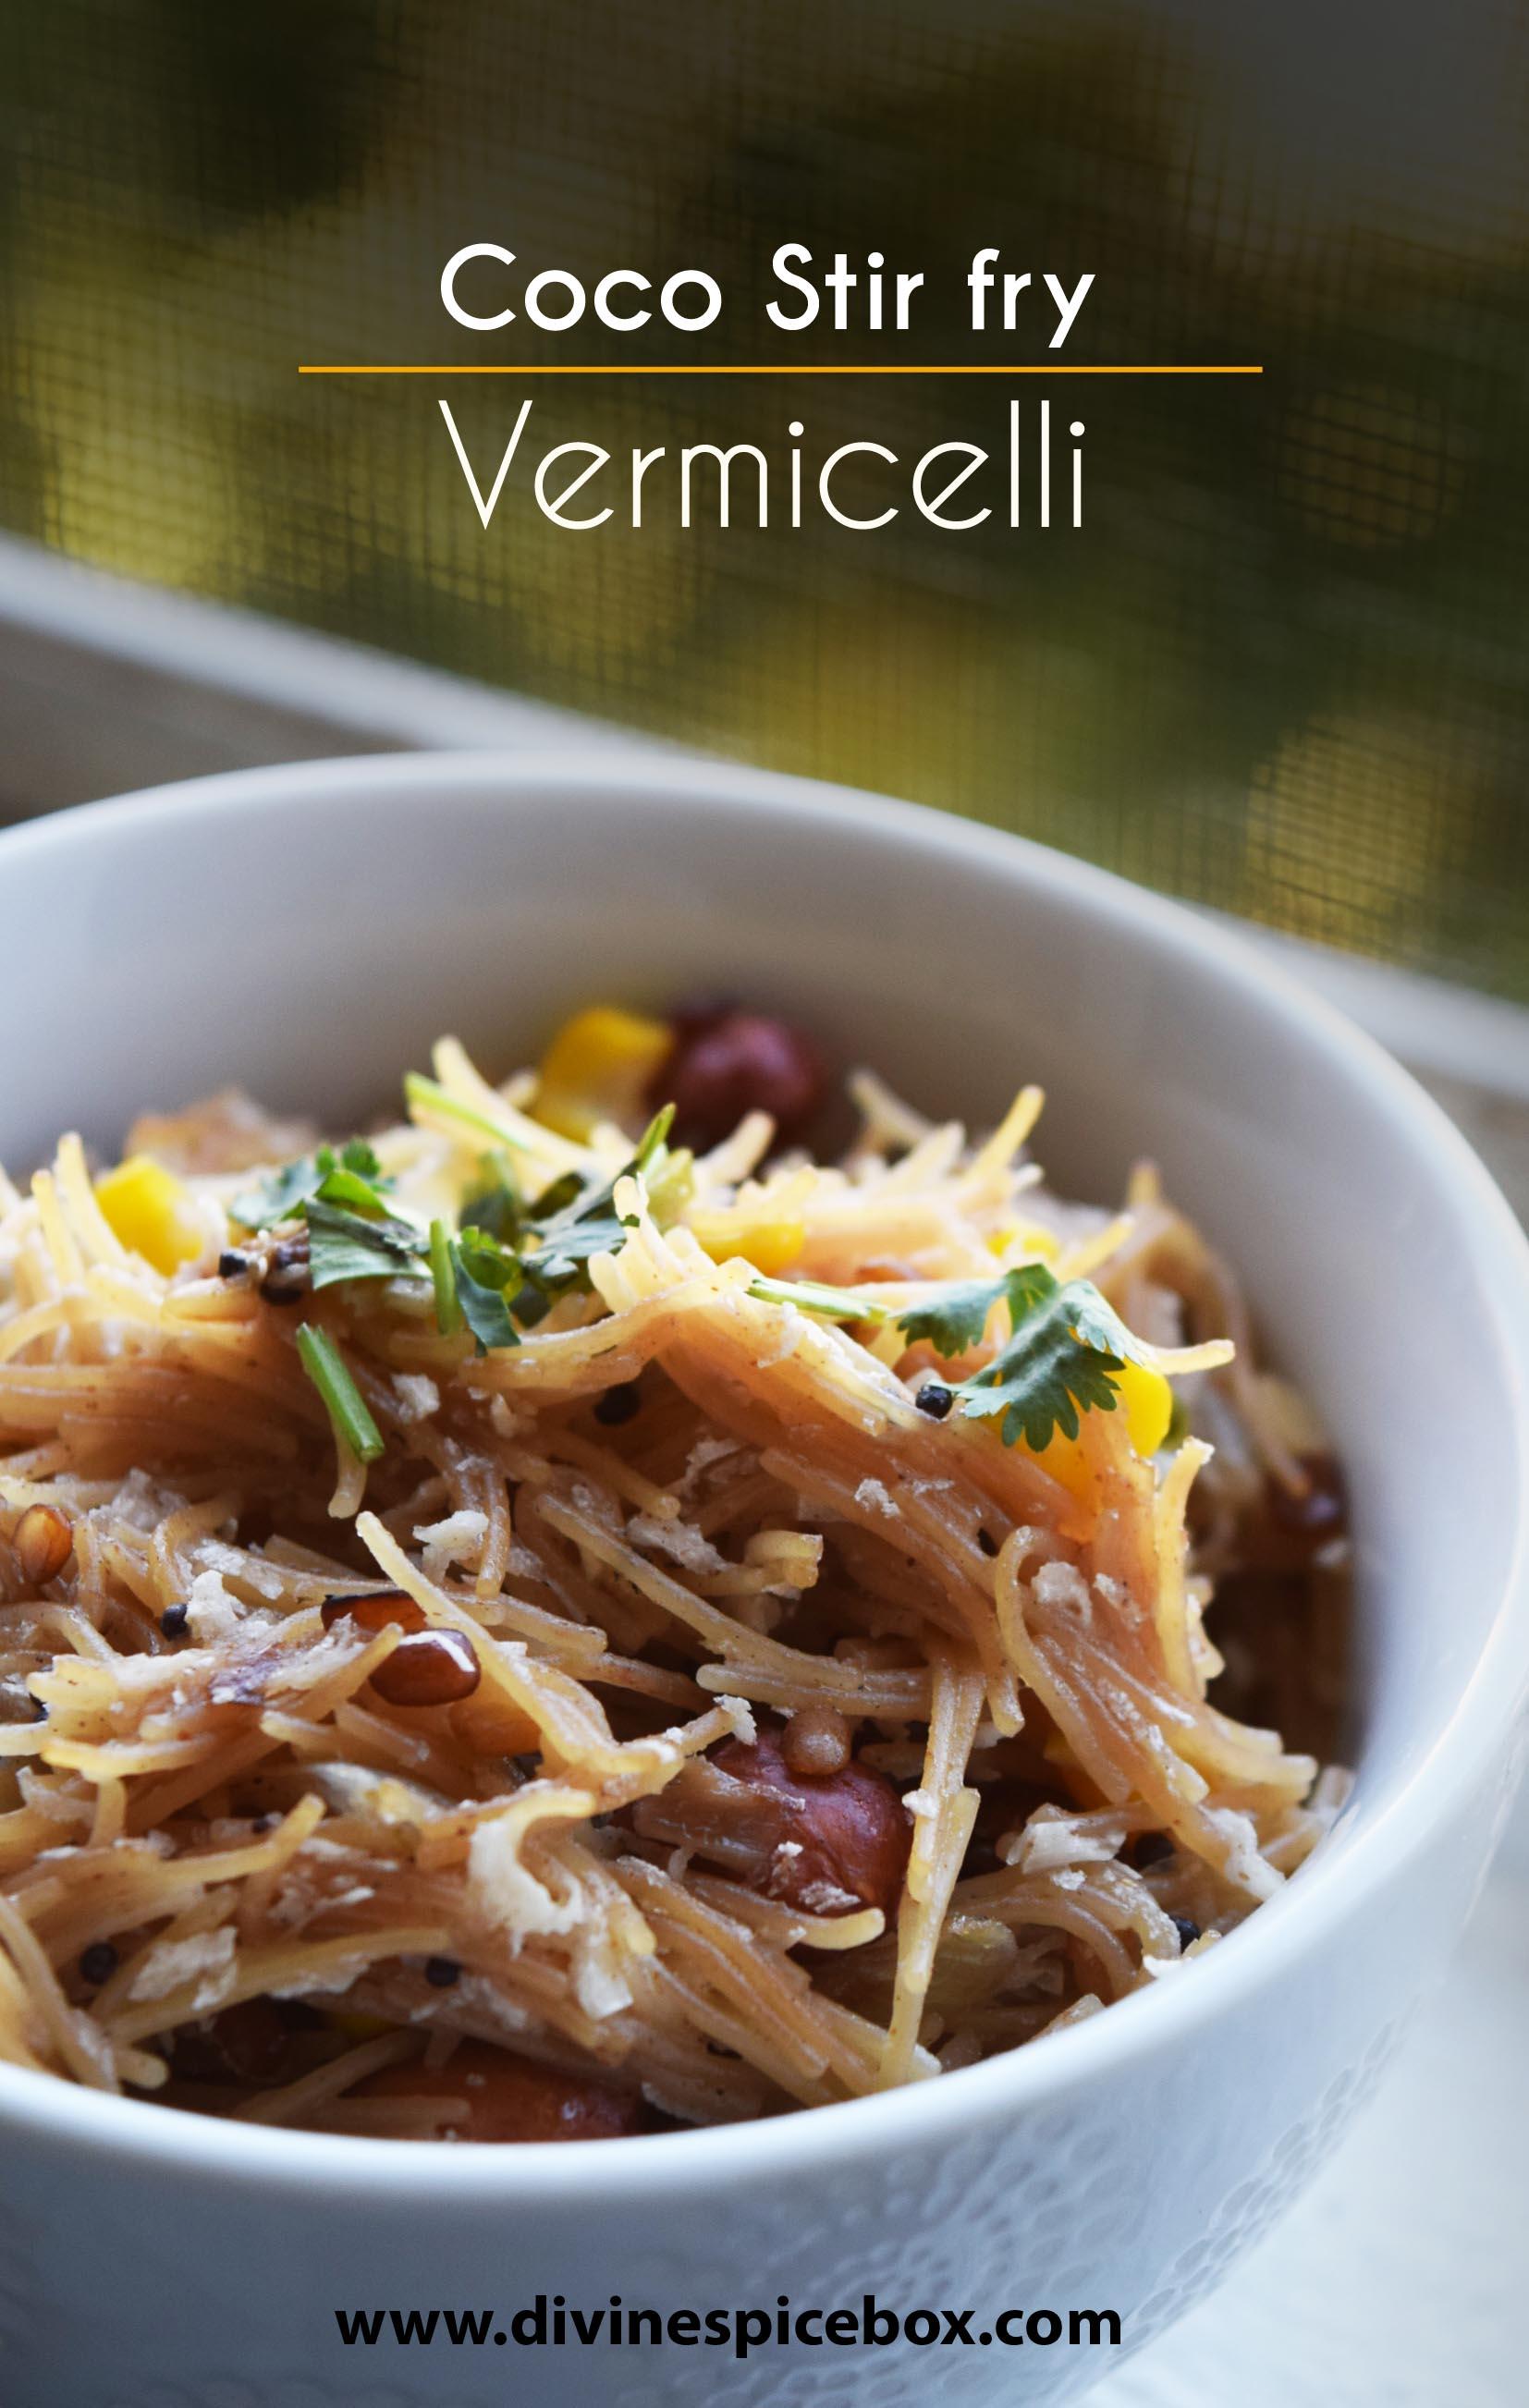 coco stir fry vermicelli copy